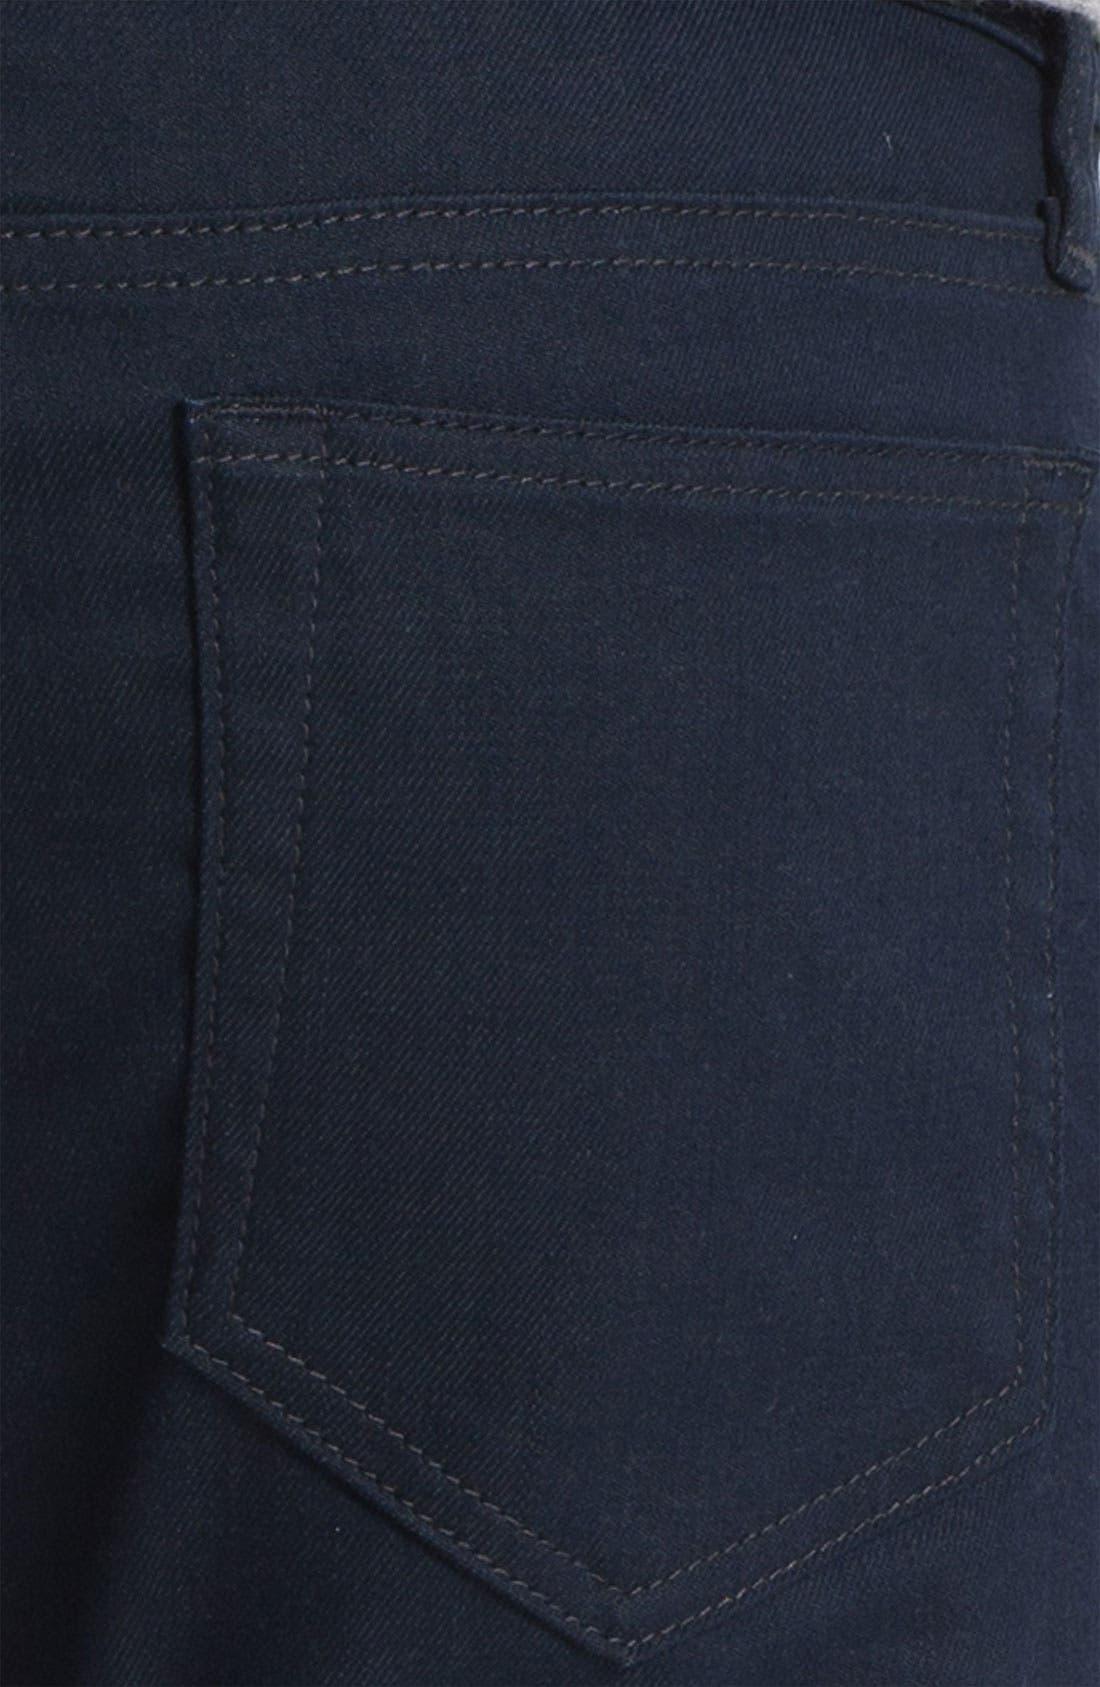 Super Slim Straight Leg Jeans,                             Alternate thumbnail 3, color,                             020